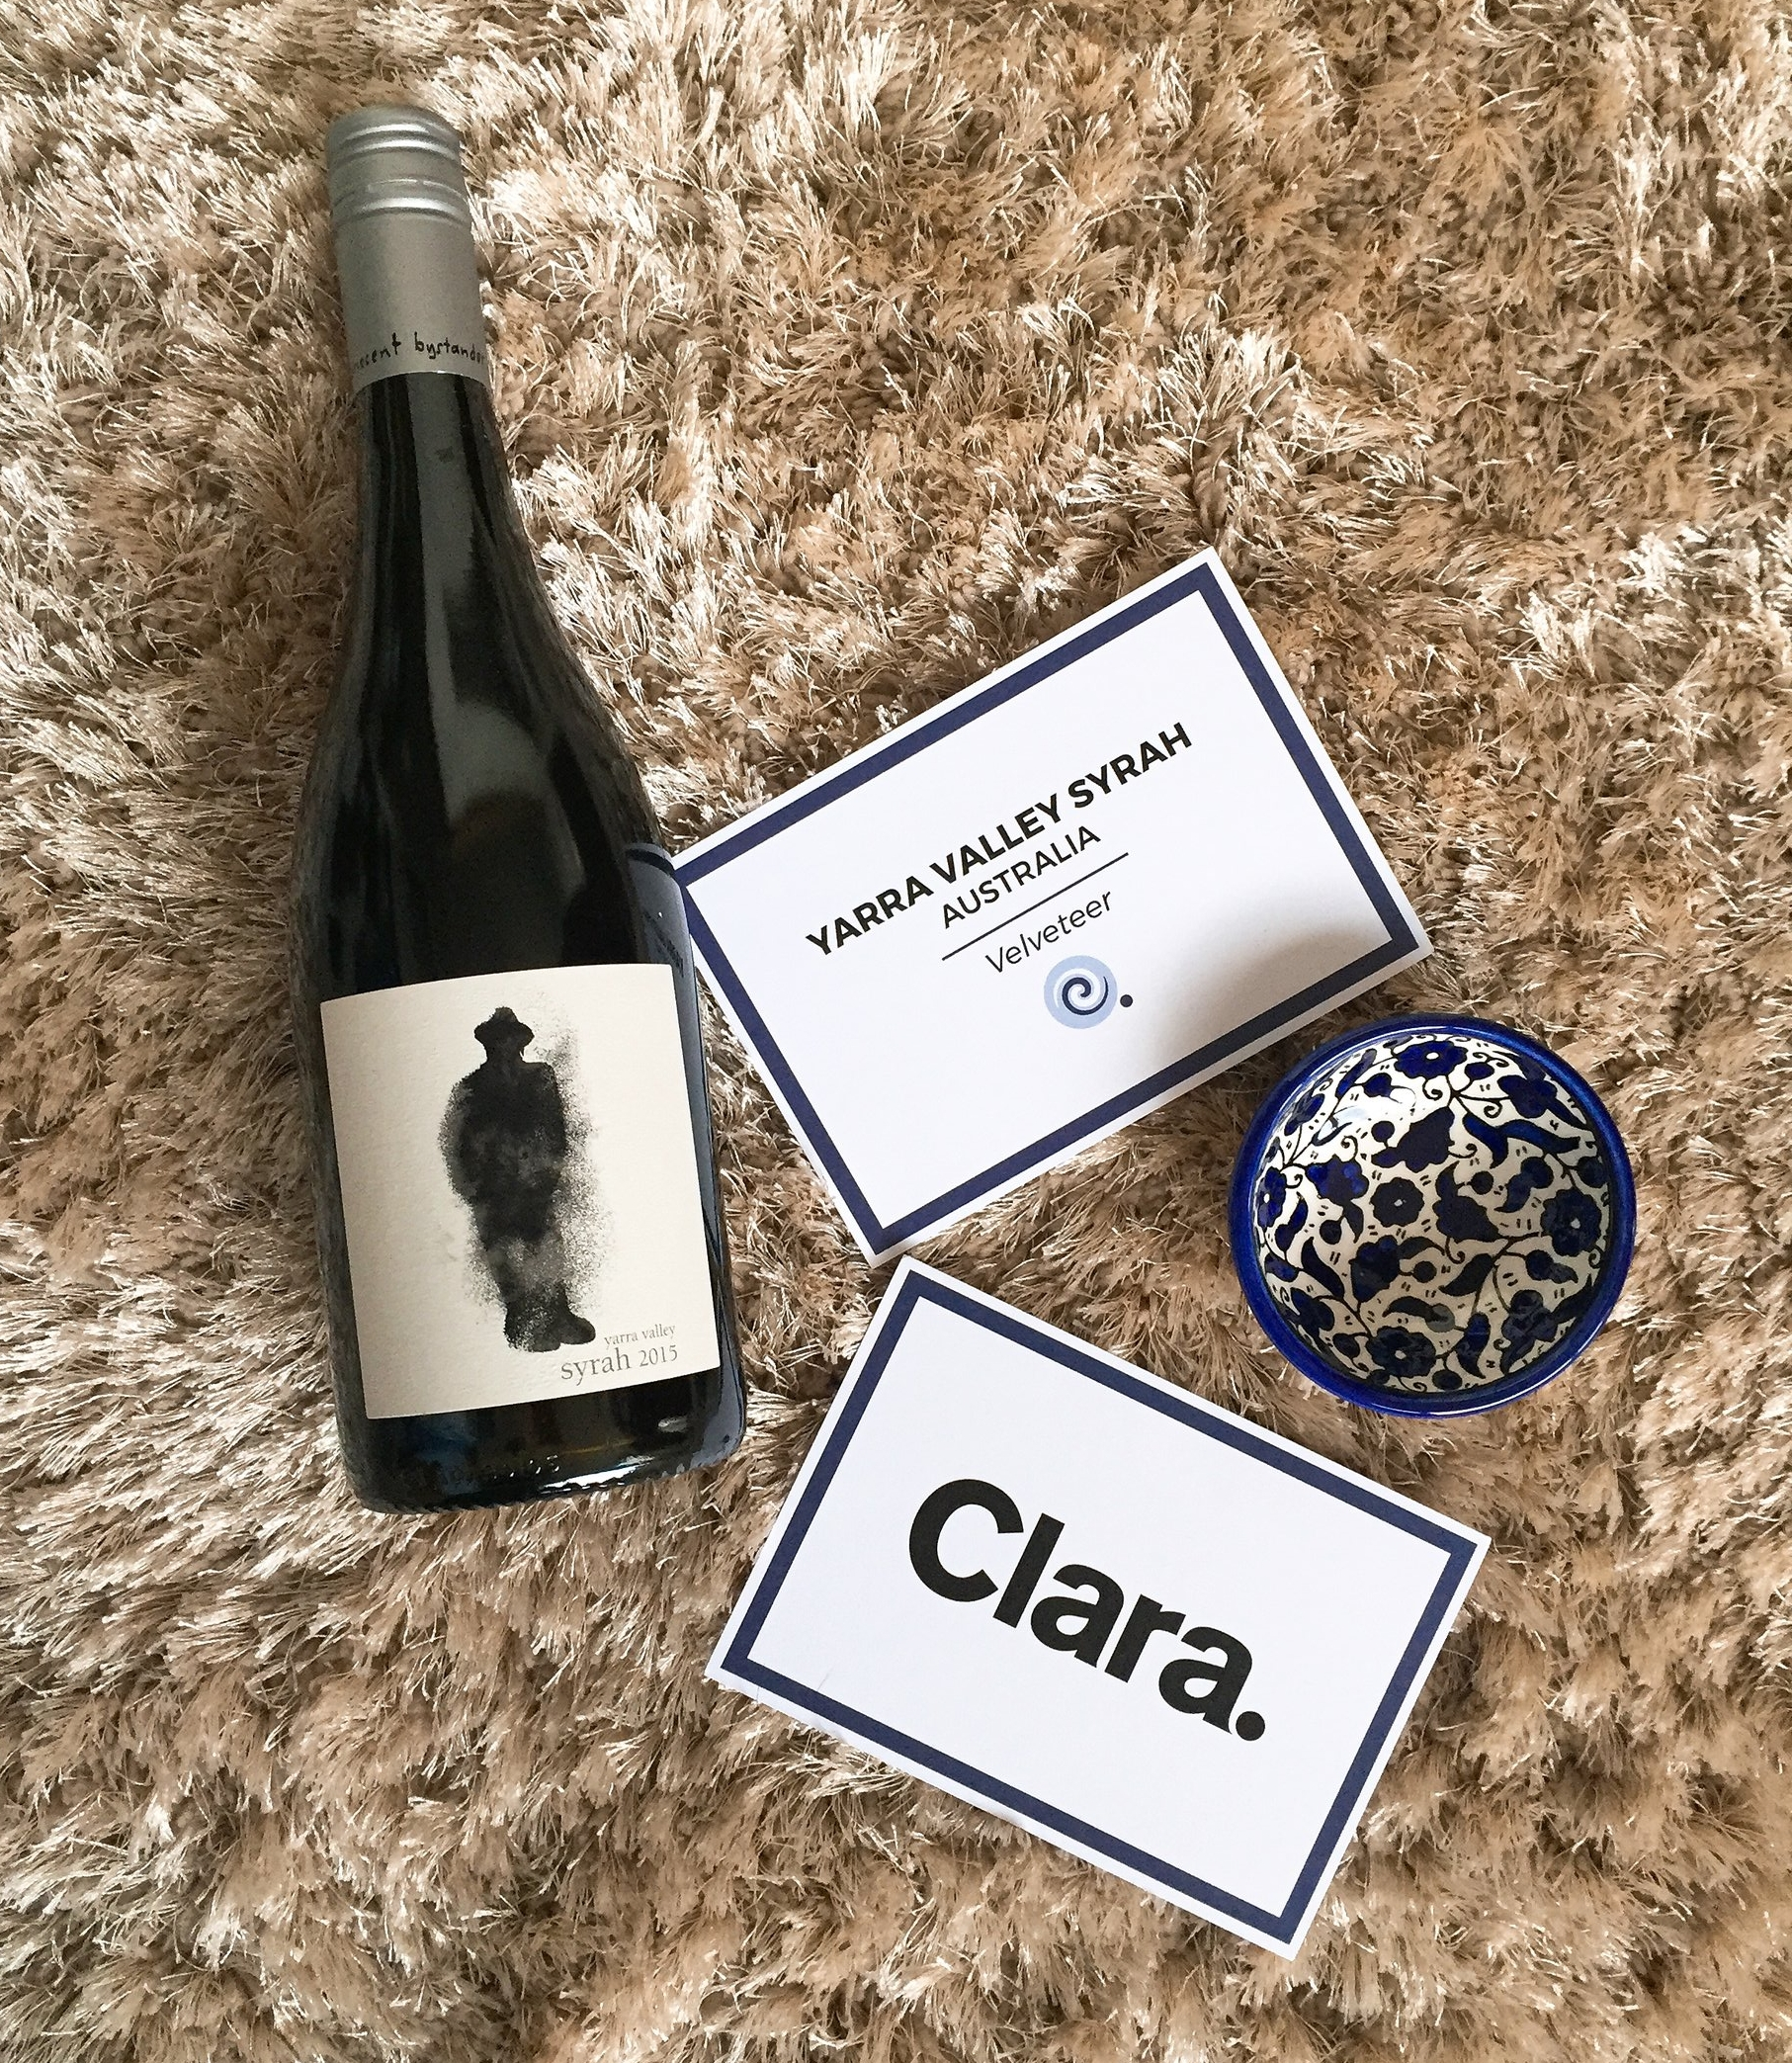 Clara wine